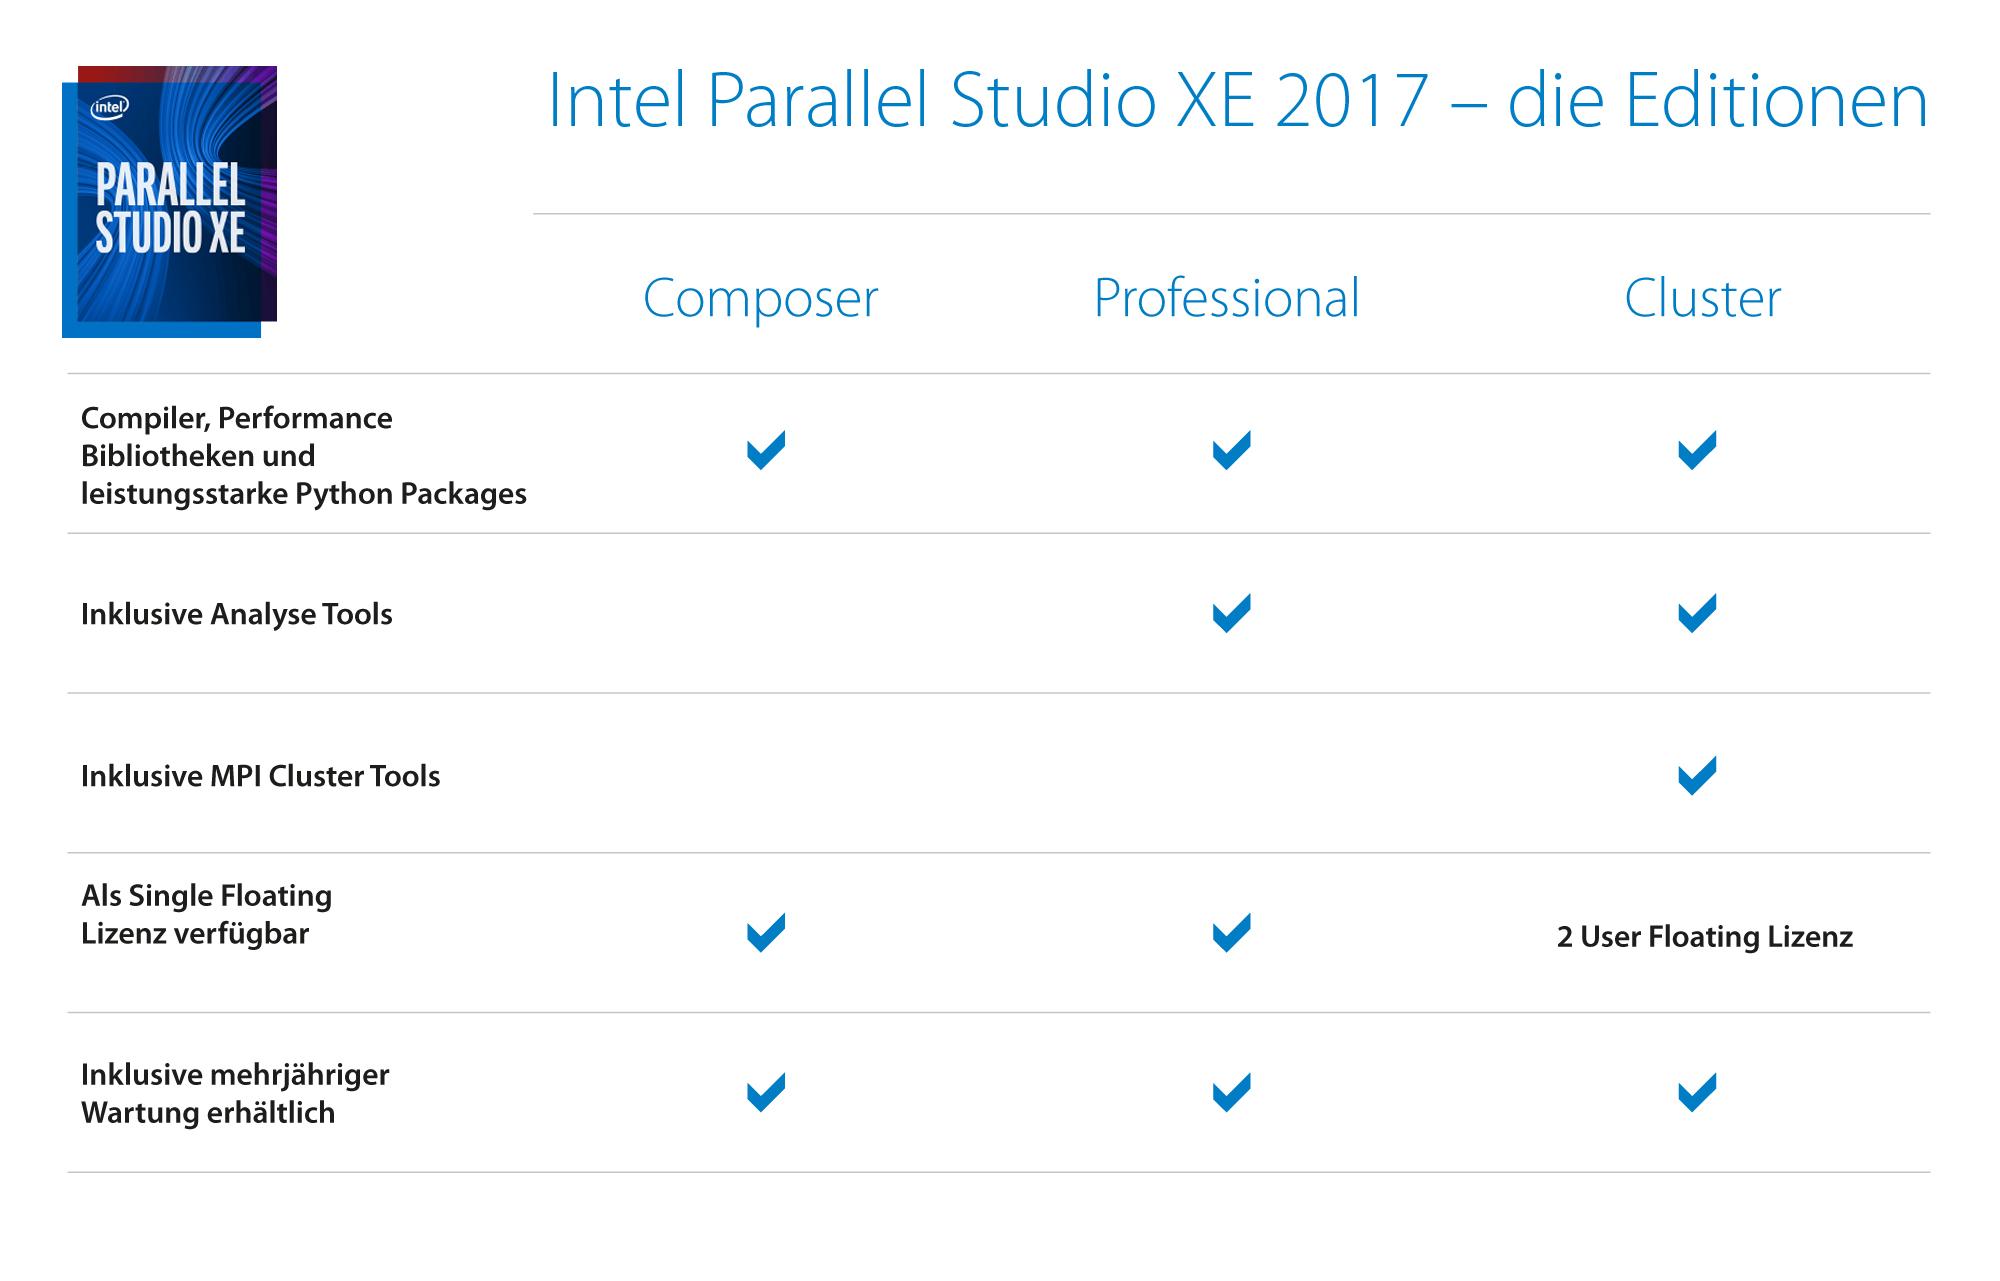 Intel Parallel Studio XE 2017 Editionen